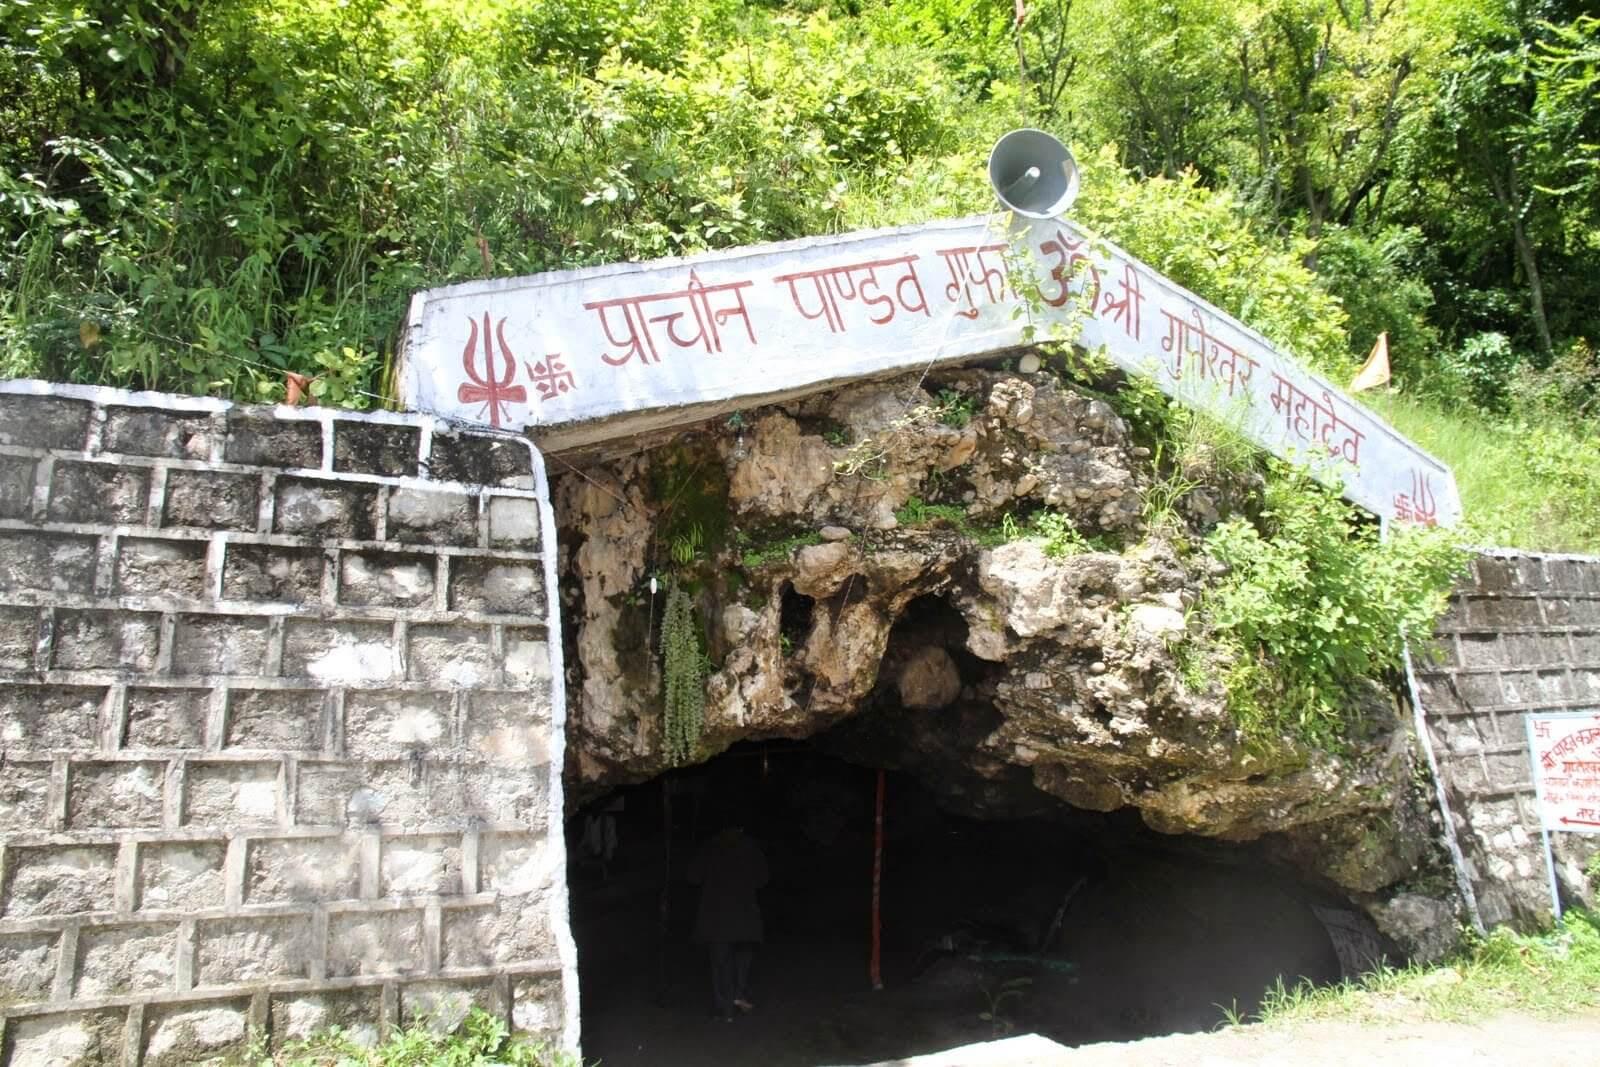 Panch Pandav Gufa Image Source: Wikimedia Commons